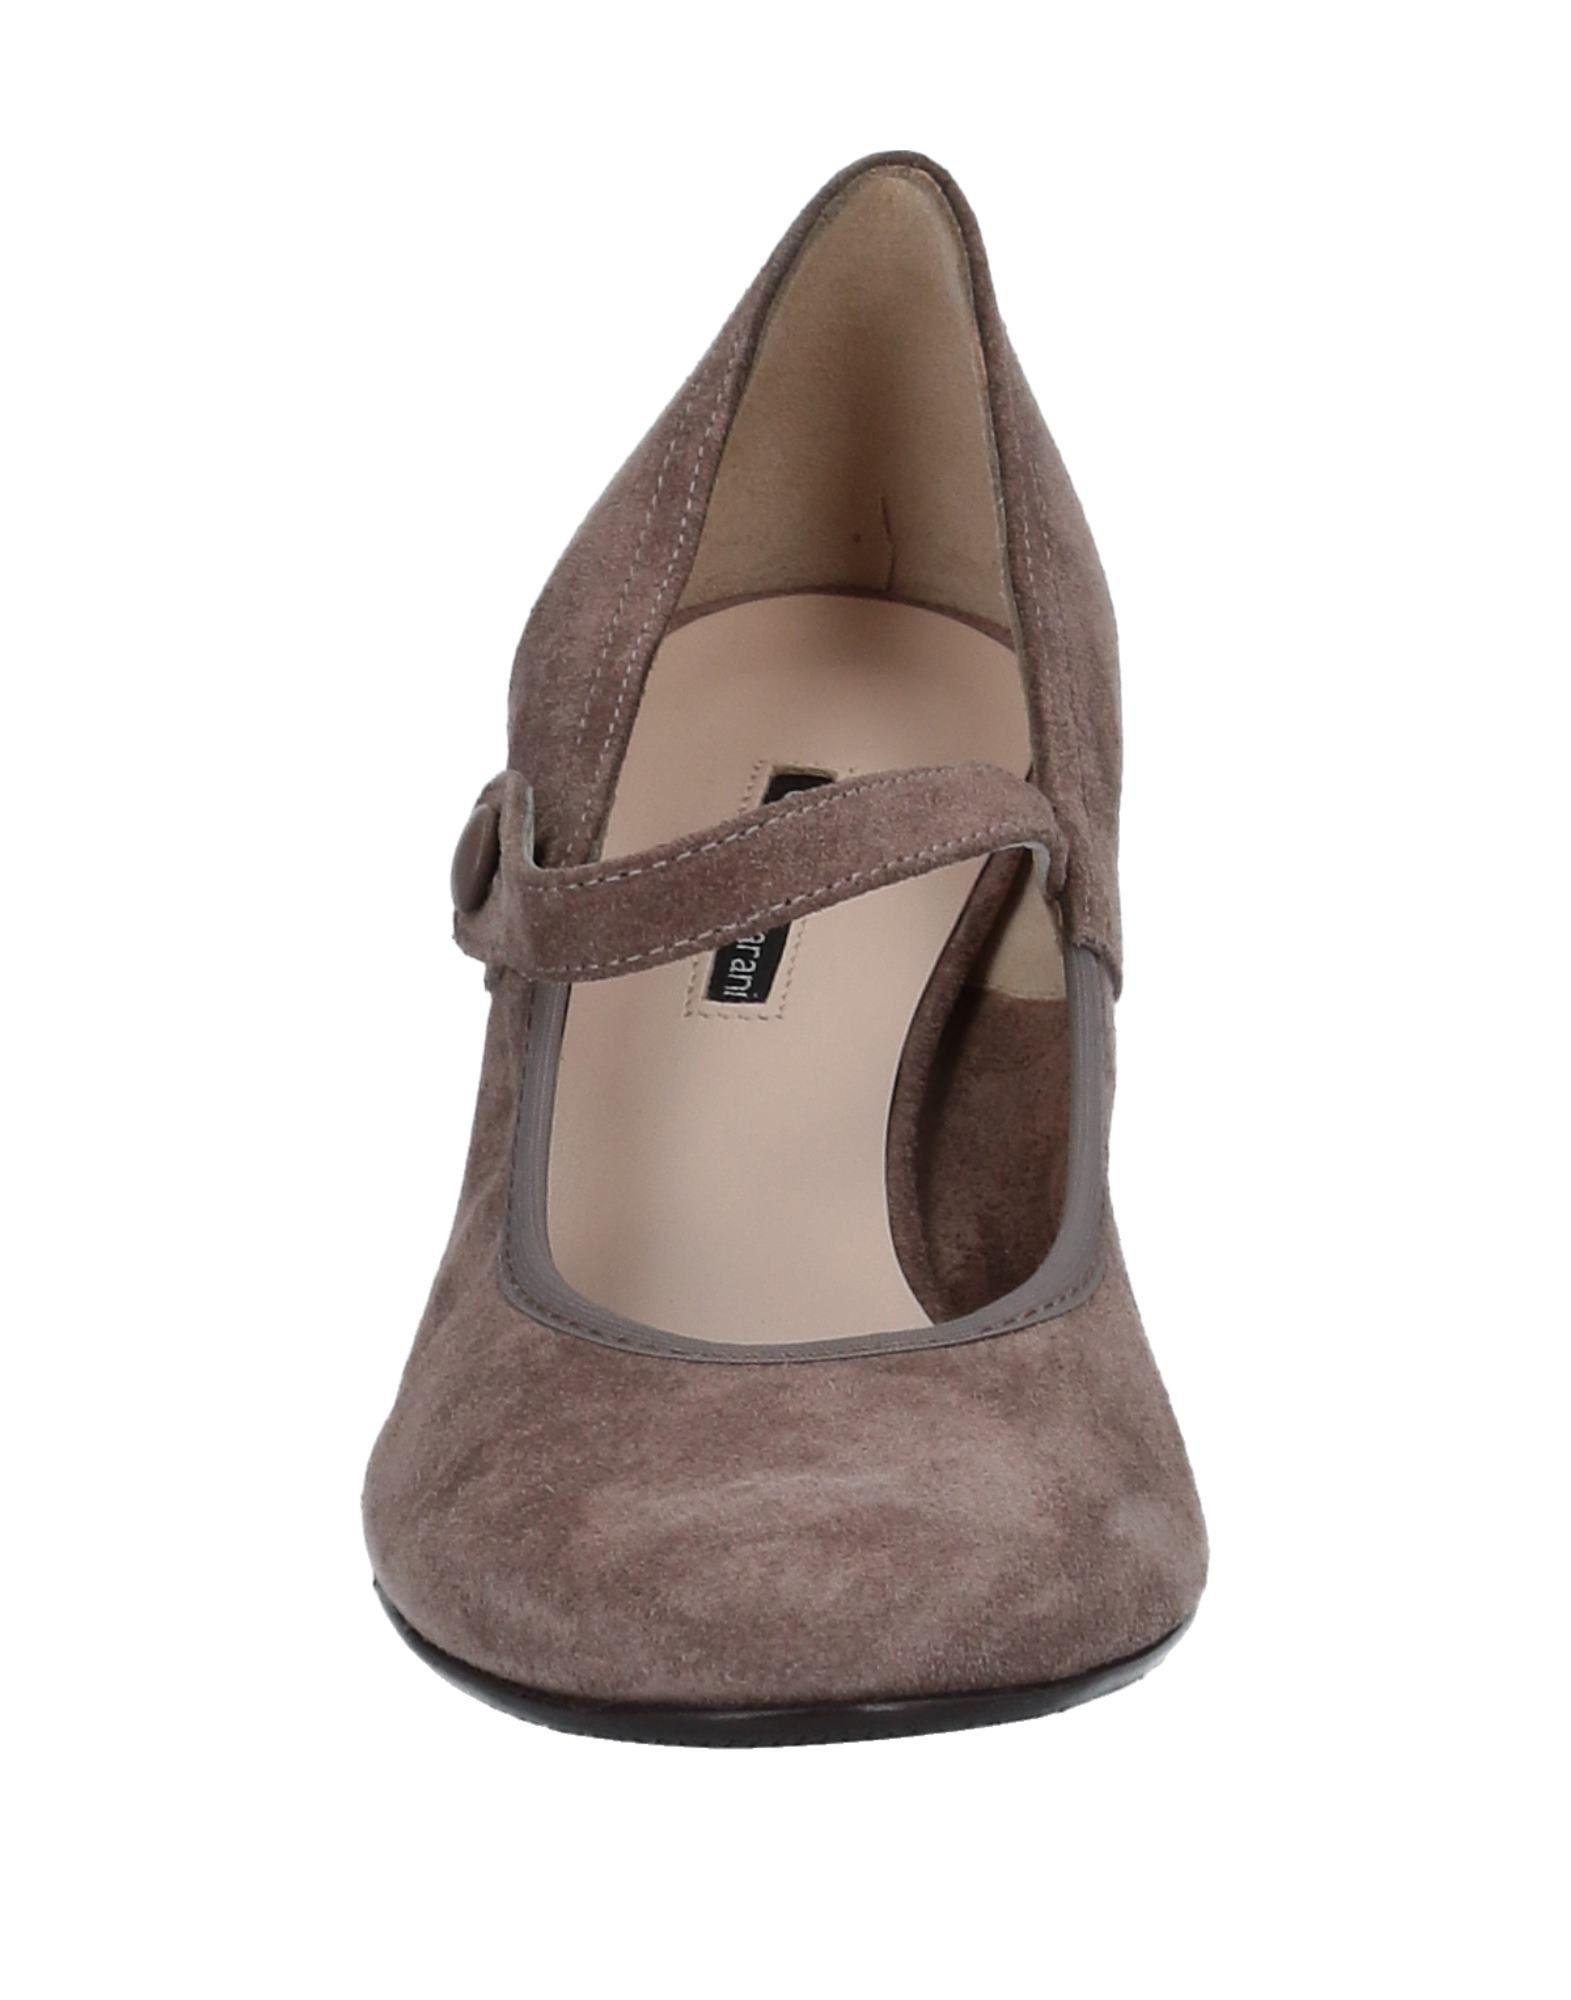 Gut um billige Schuhe Damen zu tragenDaniele Ancarani Pumps Damen Schuhe  11519089QC 9520d3